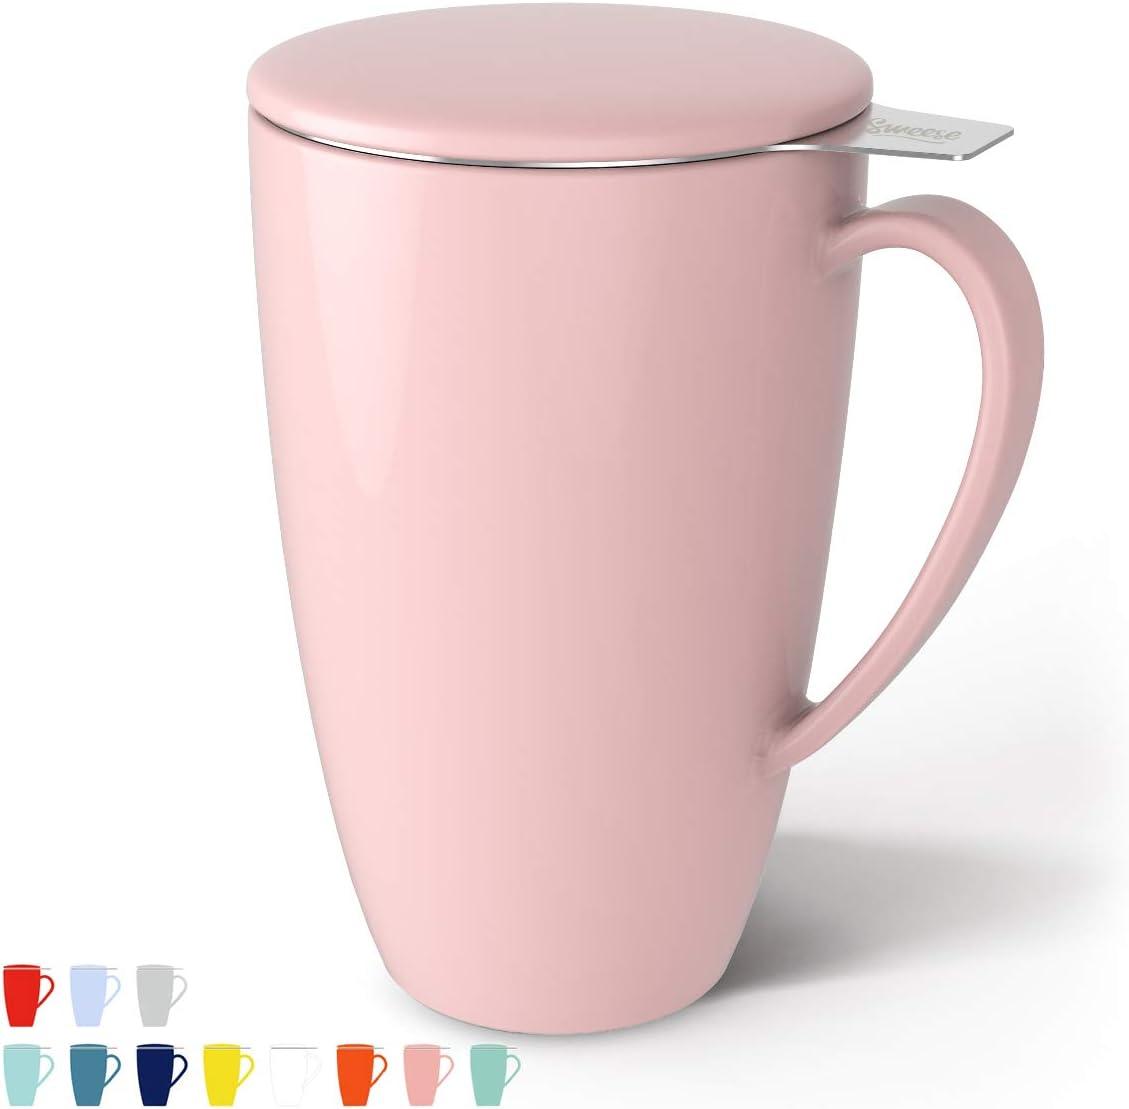 Porcelana Taza, colador de té vasos, tazas de té con filtro y tapa, 400 ml Rosa